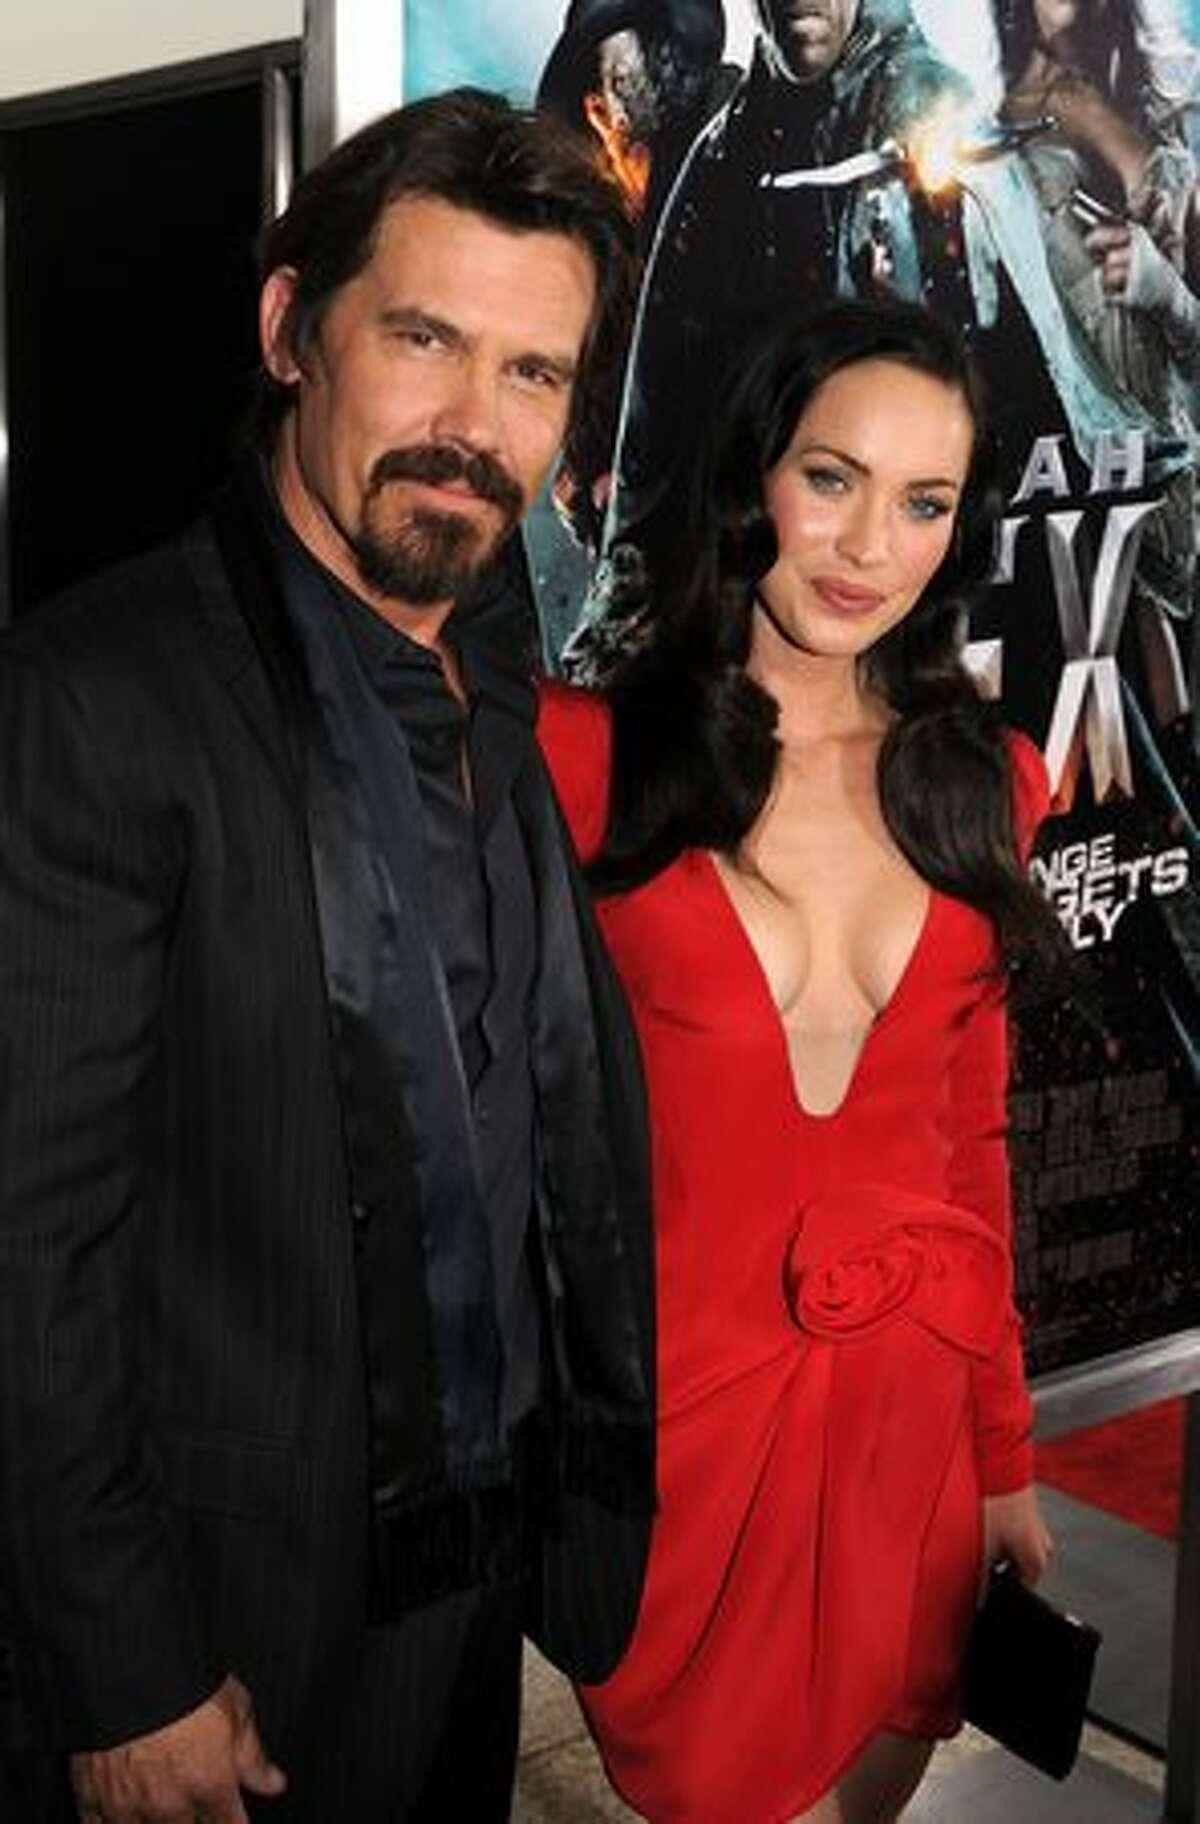 Actors Josh Brolin and Megan Fox arrive at premiere of Warner Bros.